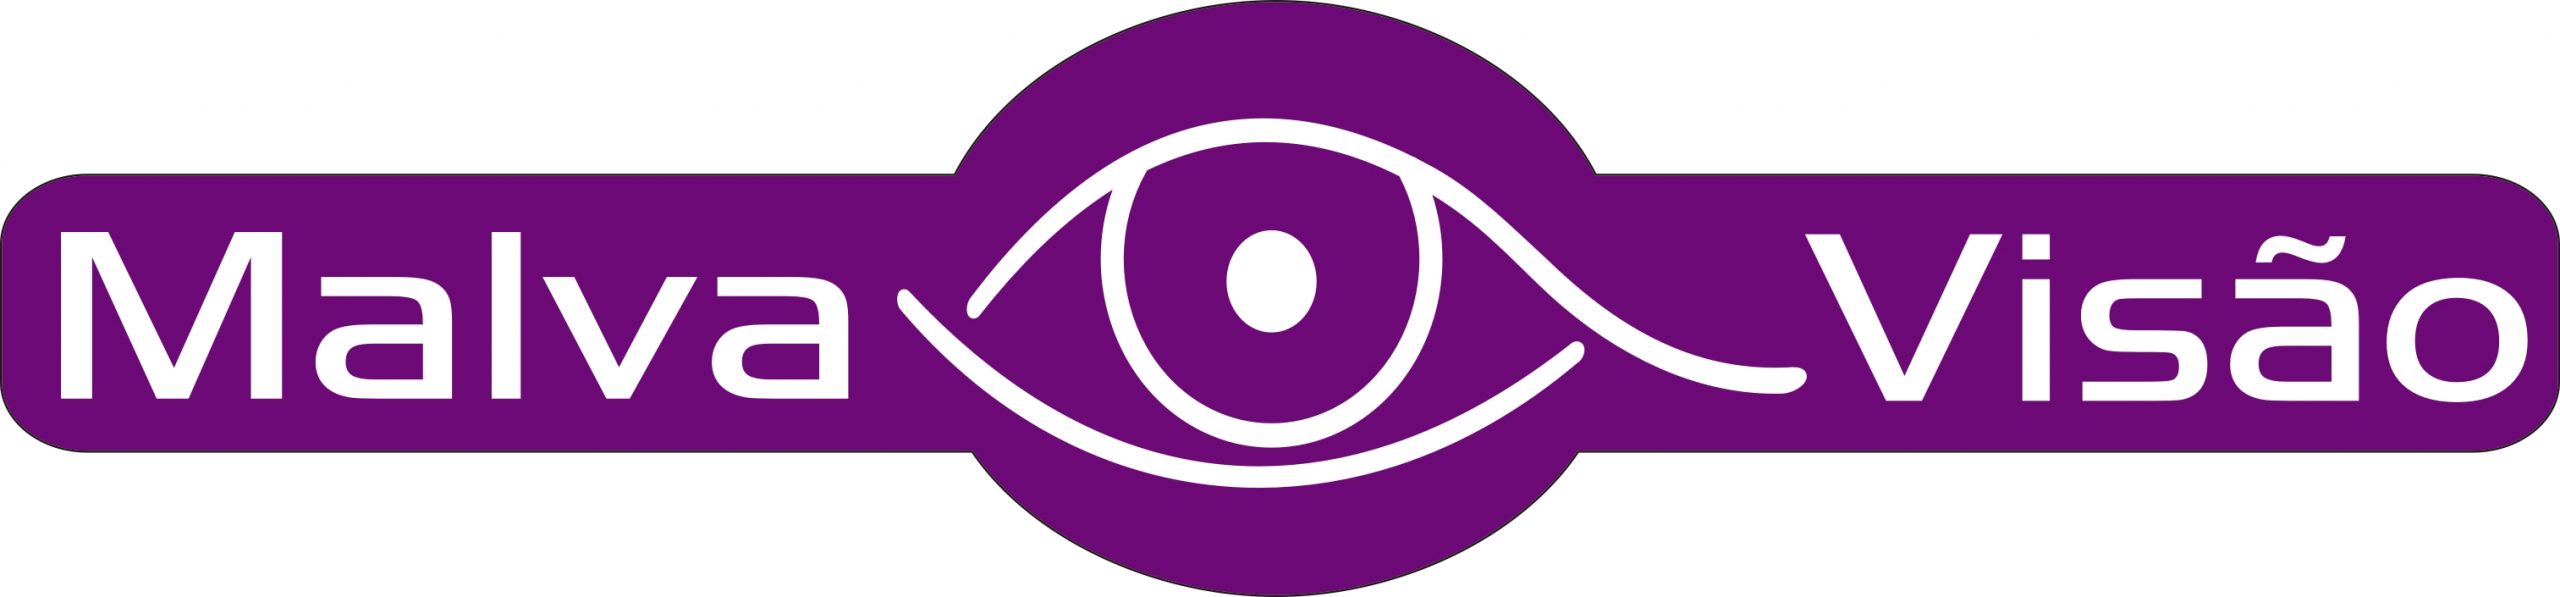 logotipo-malva-visao-